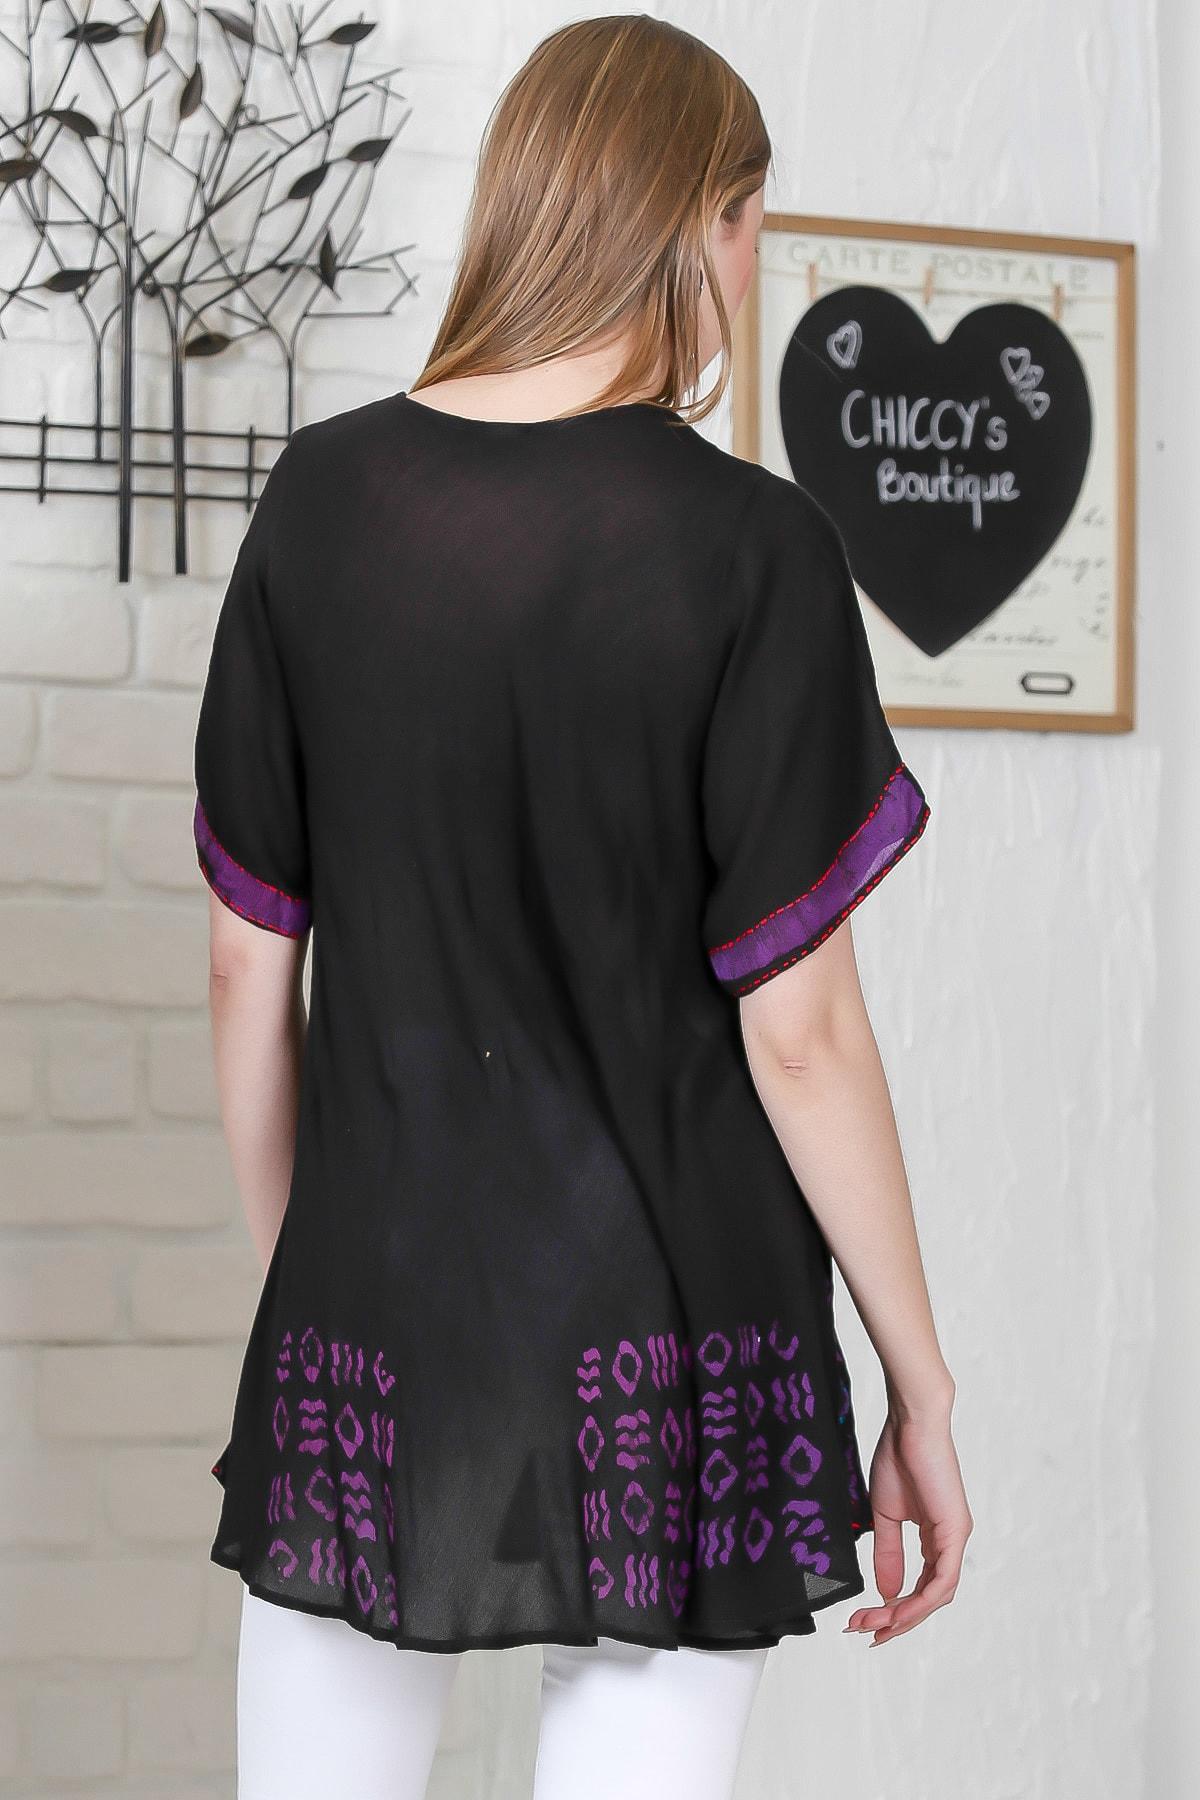 Chiccy Kadın Siyah Çiçek Baskılı Nakış Dikişli Kısa Kol Batik Salaş Dokuma Bluz M10010200BL95495 4